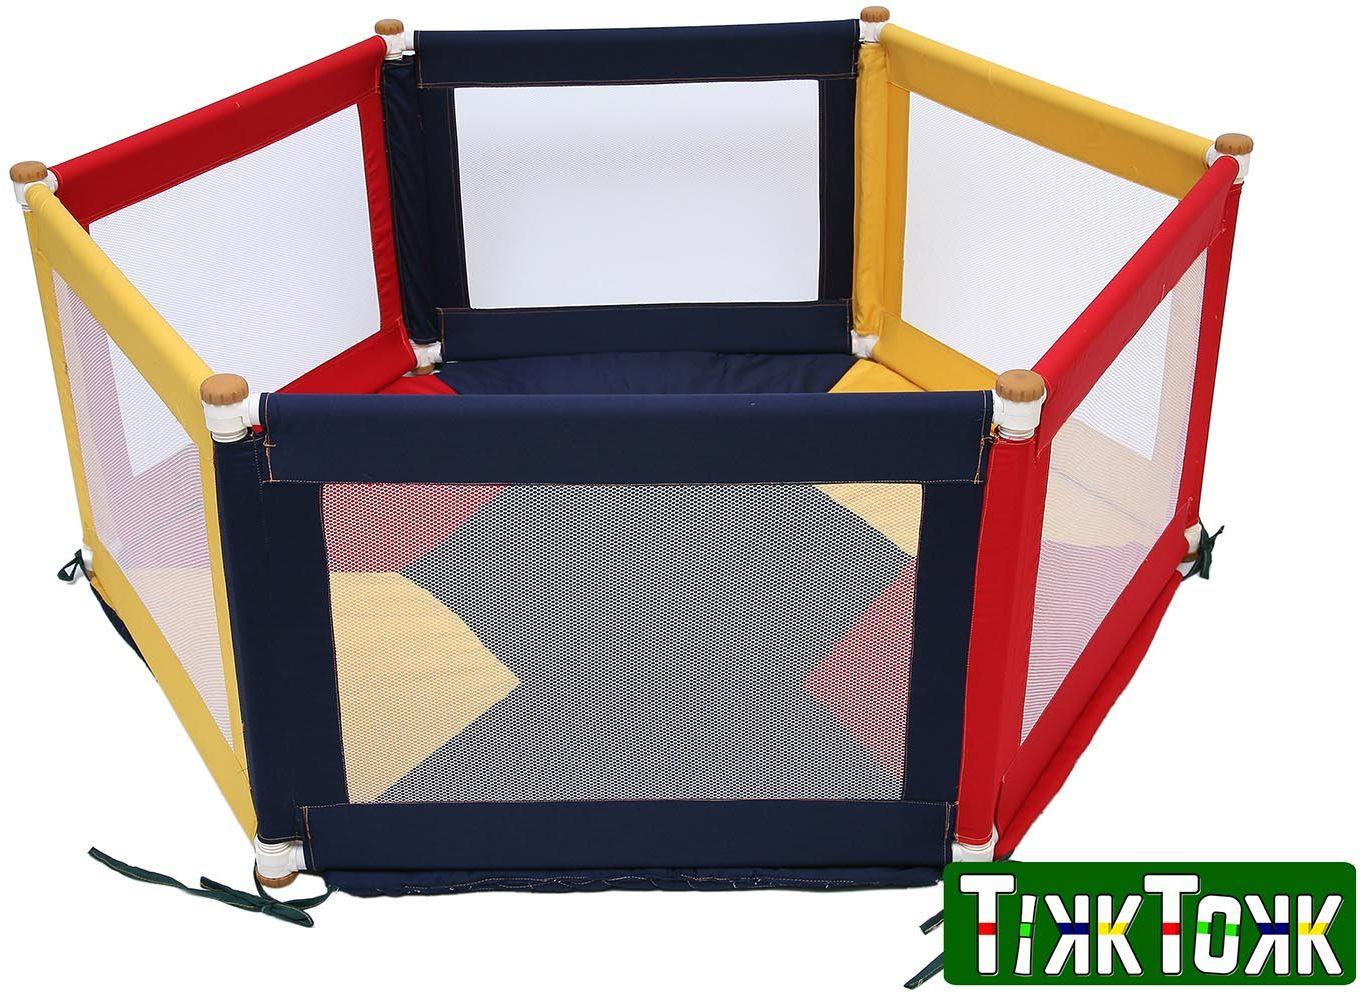 TikkTokk - Kojec Pokano trójkolorowy hex